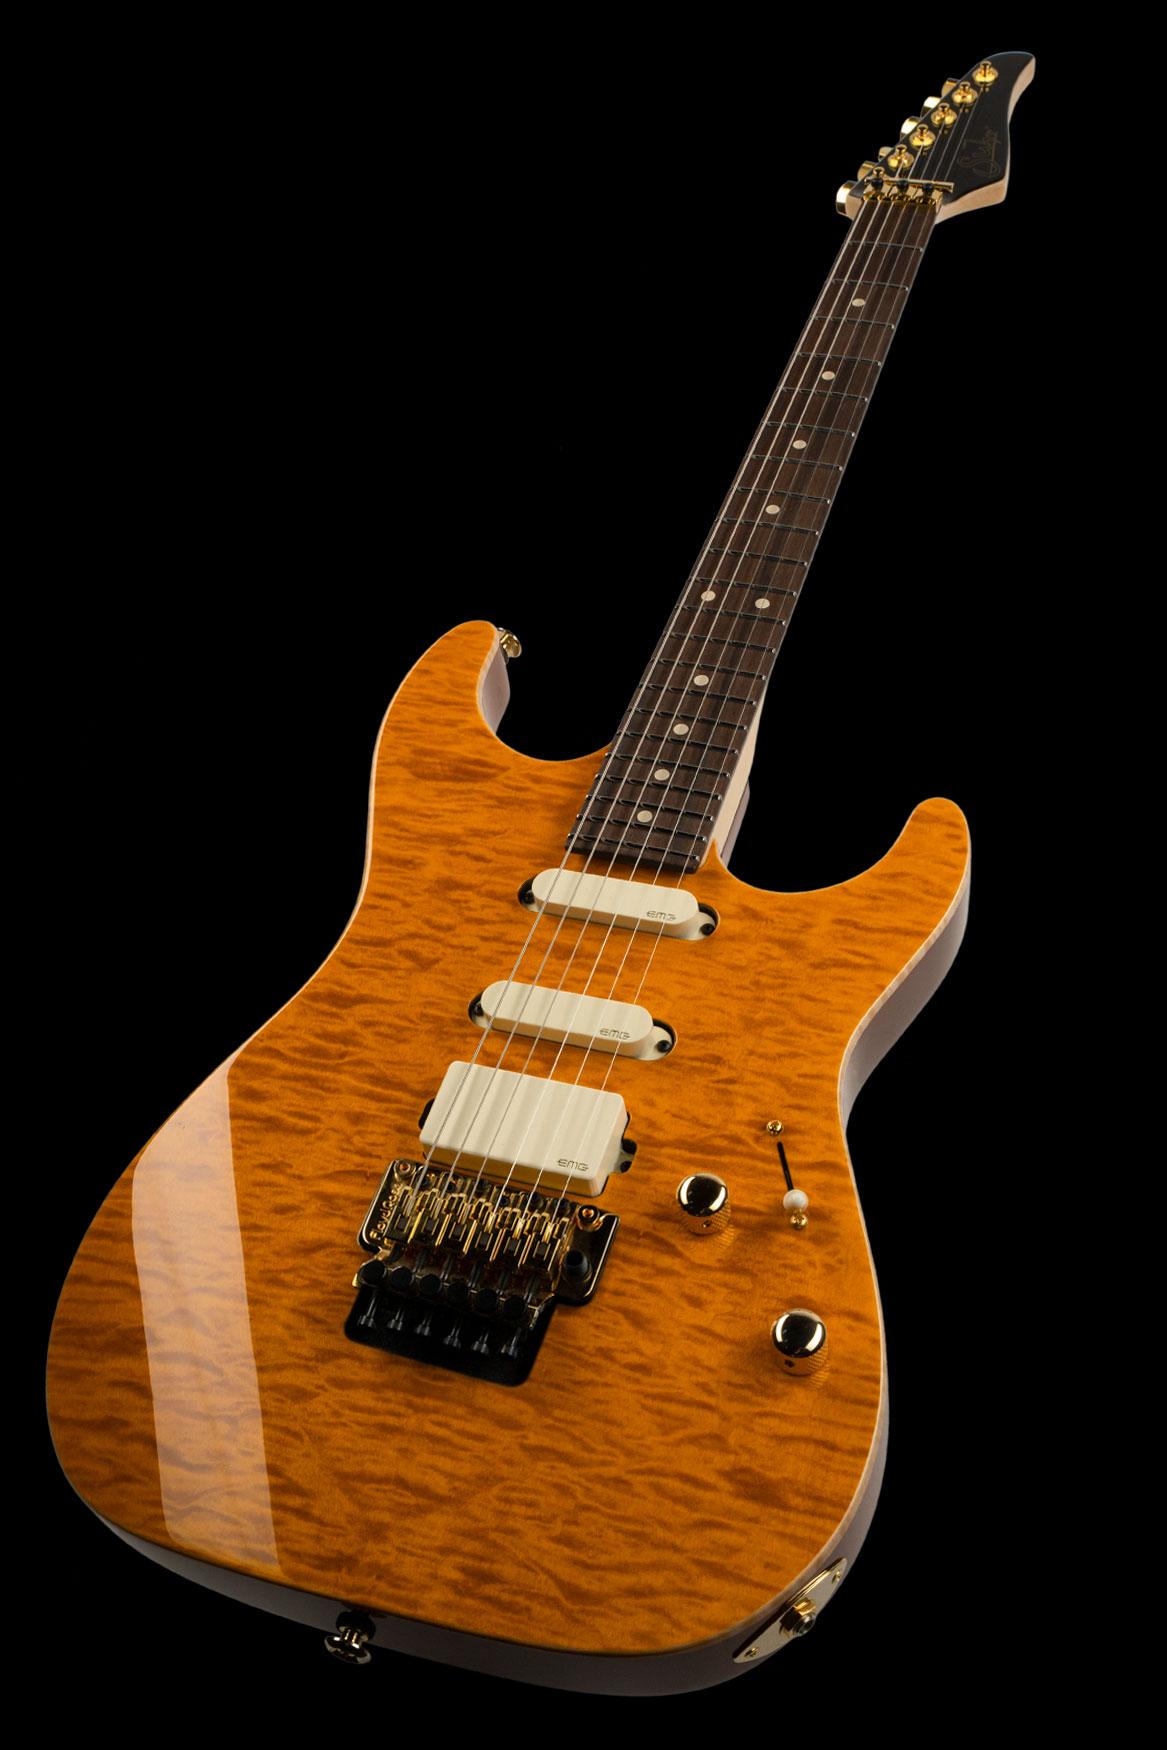 01-LTD-0034: Standard Legacy, Trans Caramel, Original Floyd Rose